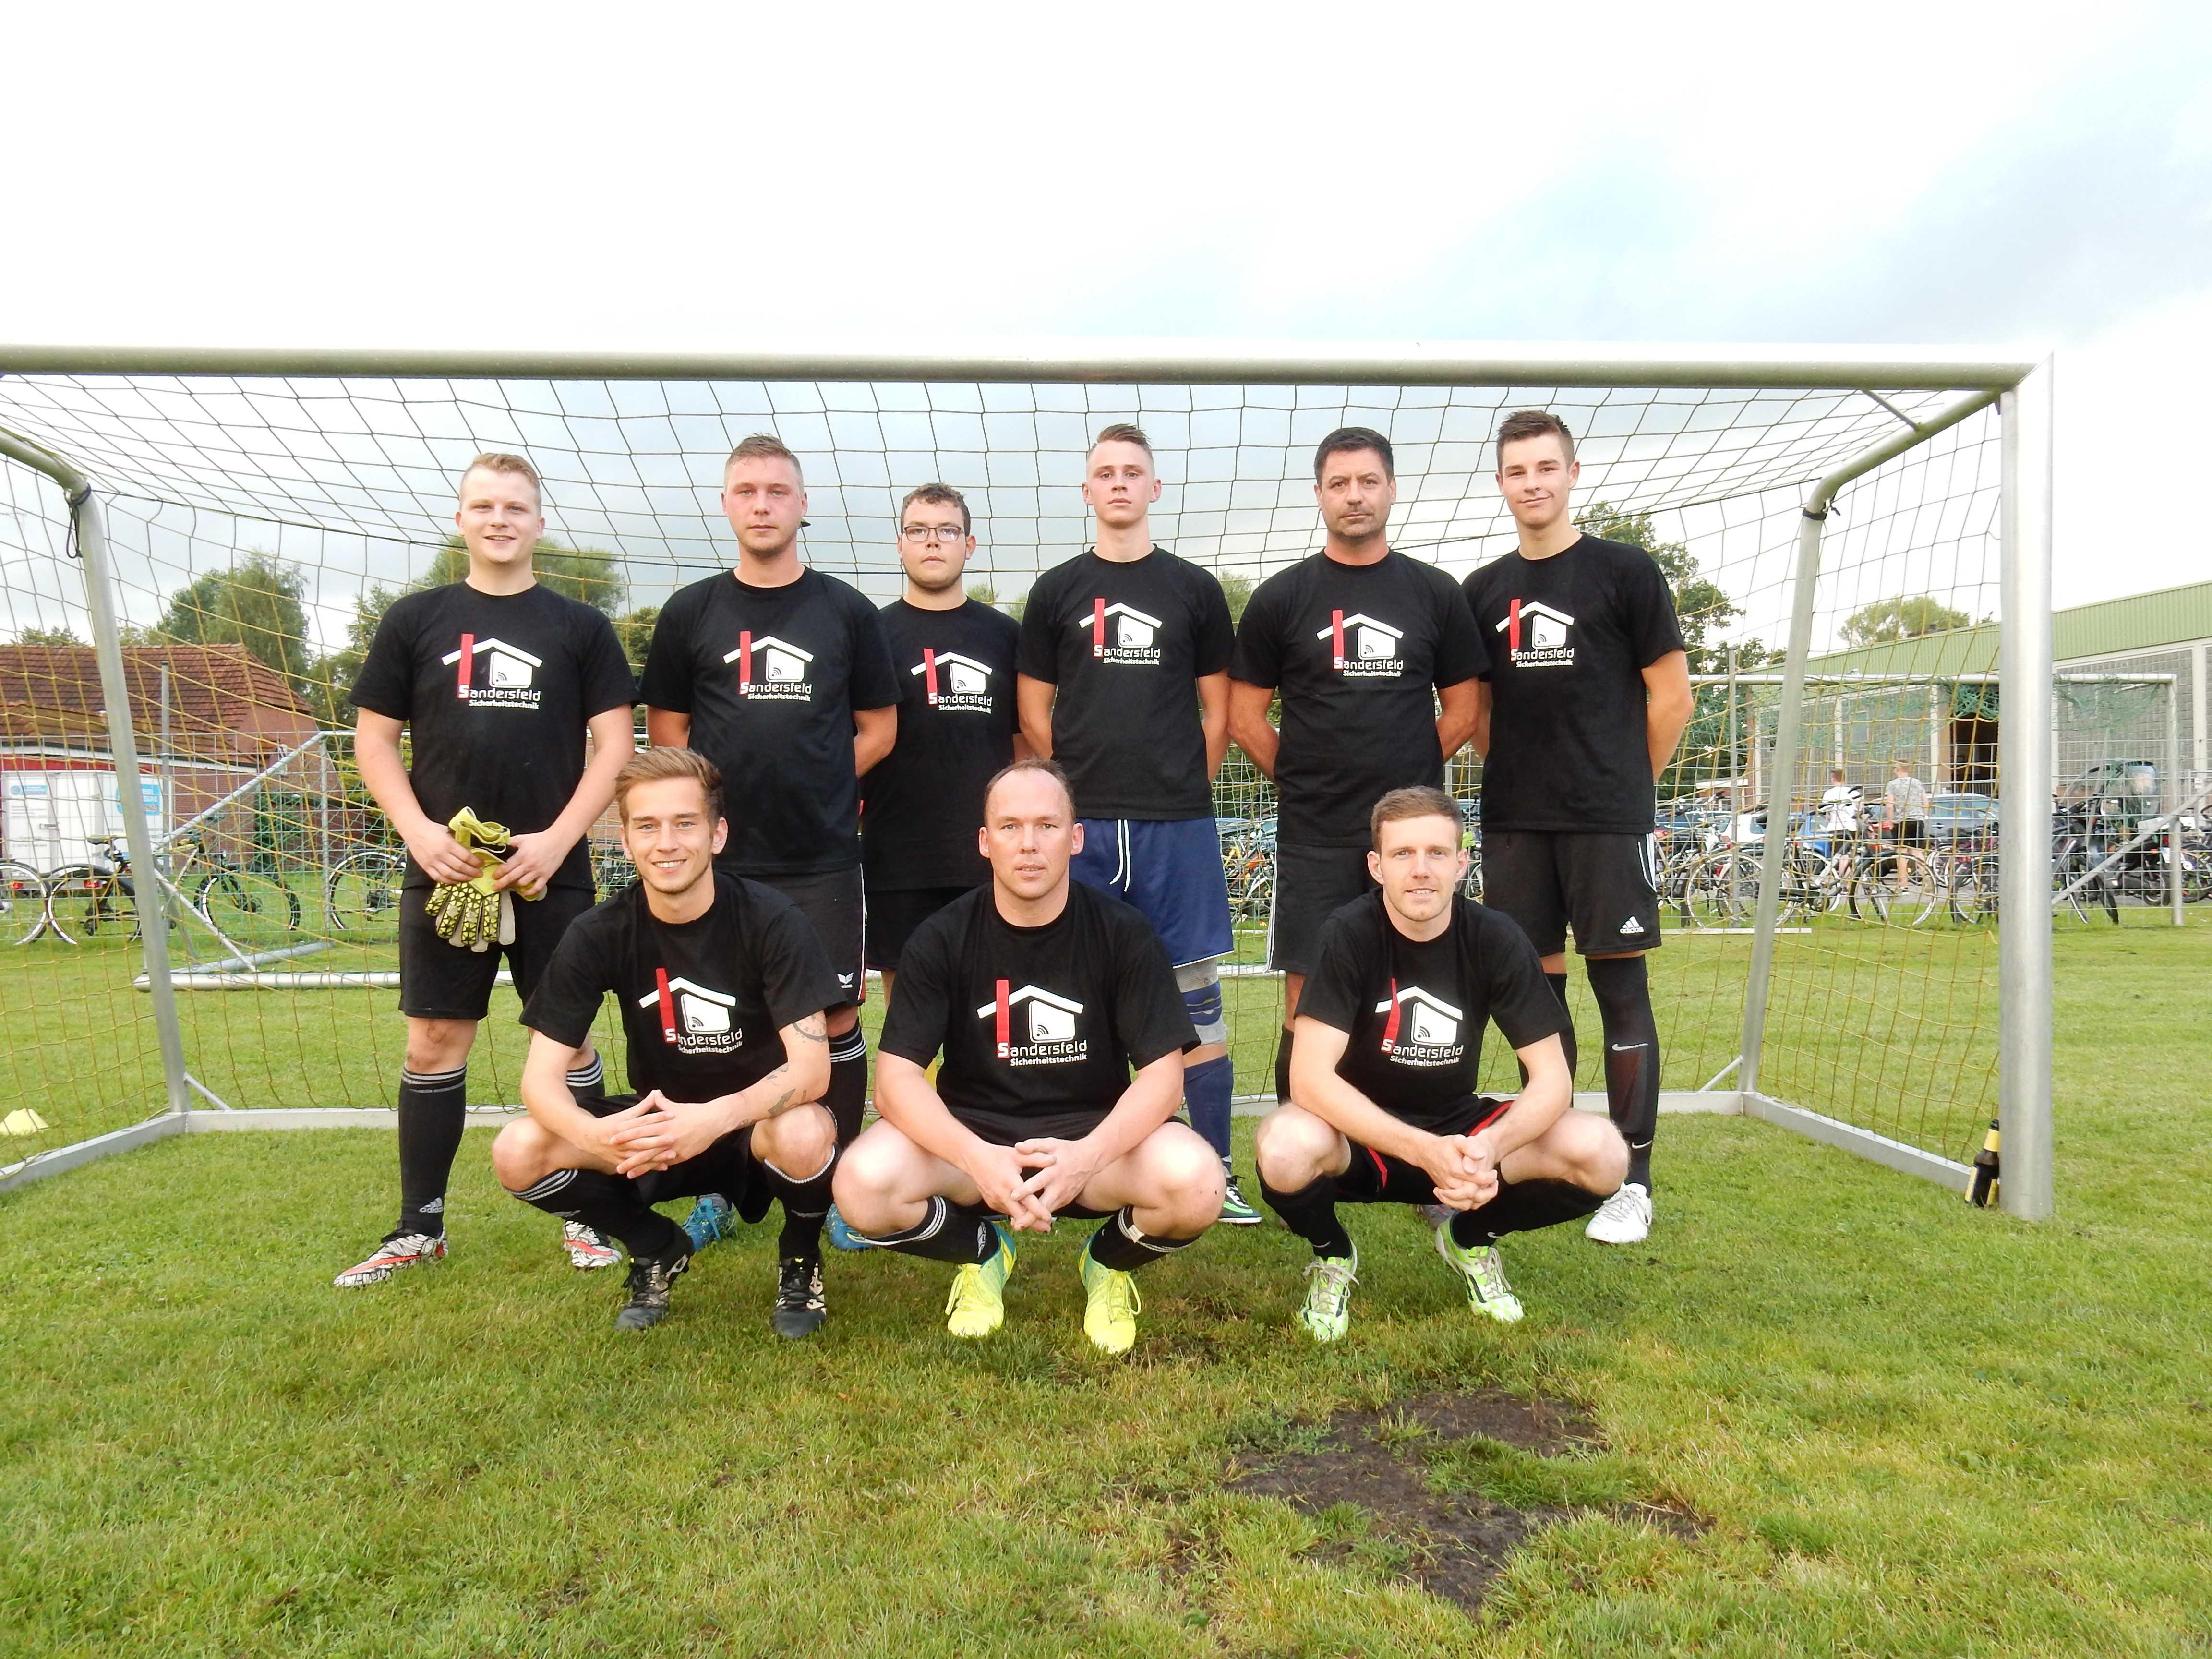 2016-07-29 Sportwoche - erster Freitag (28)